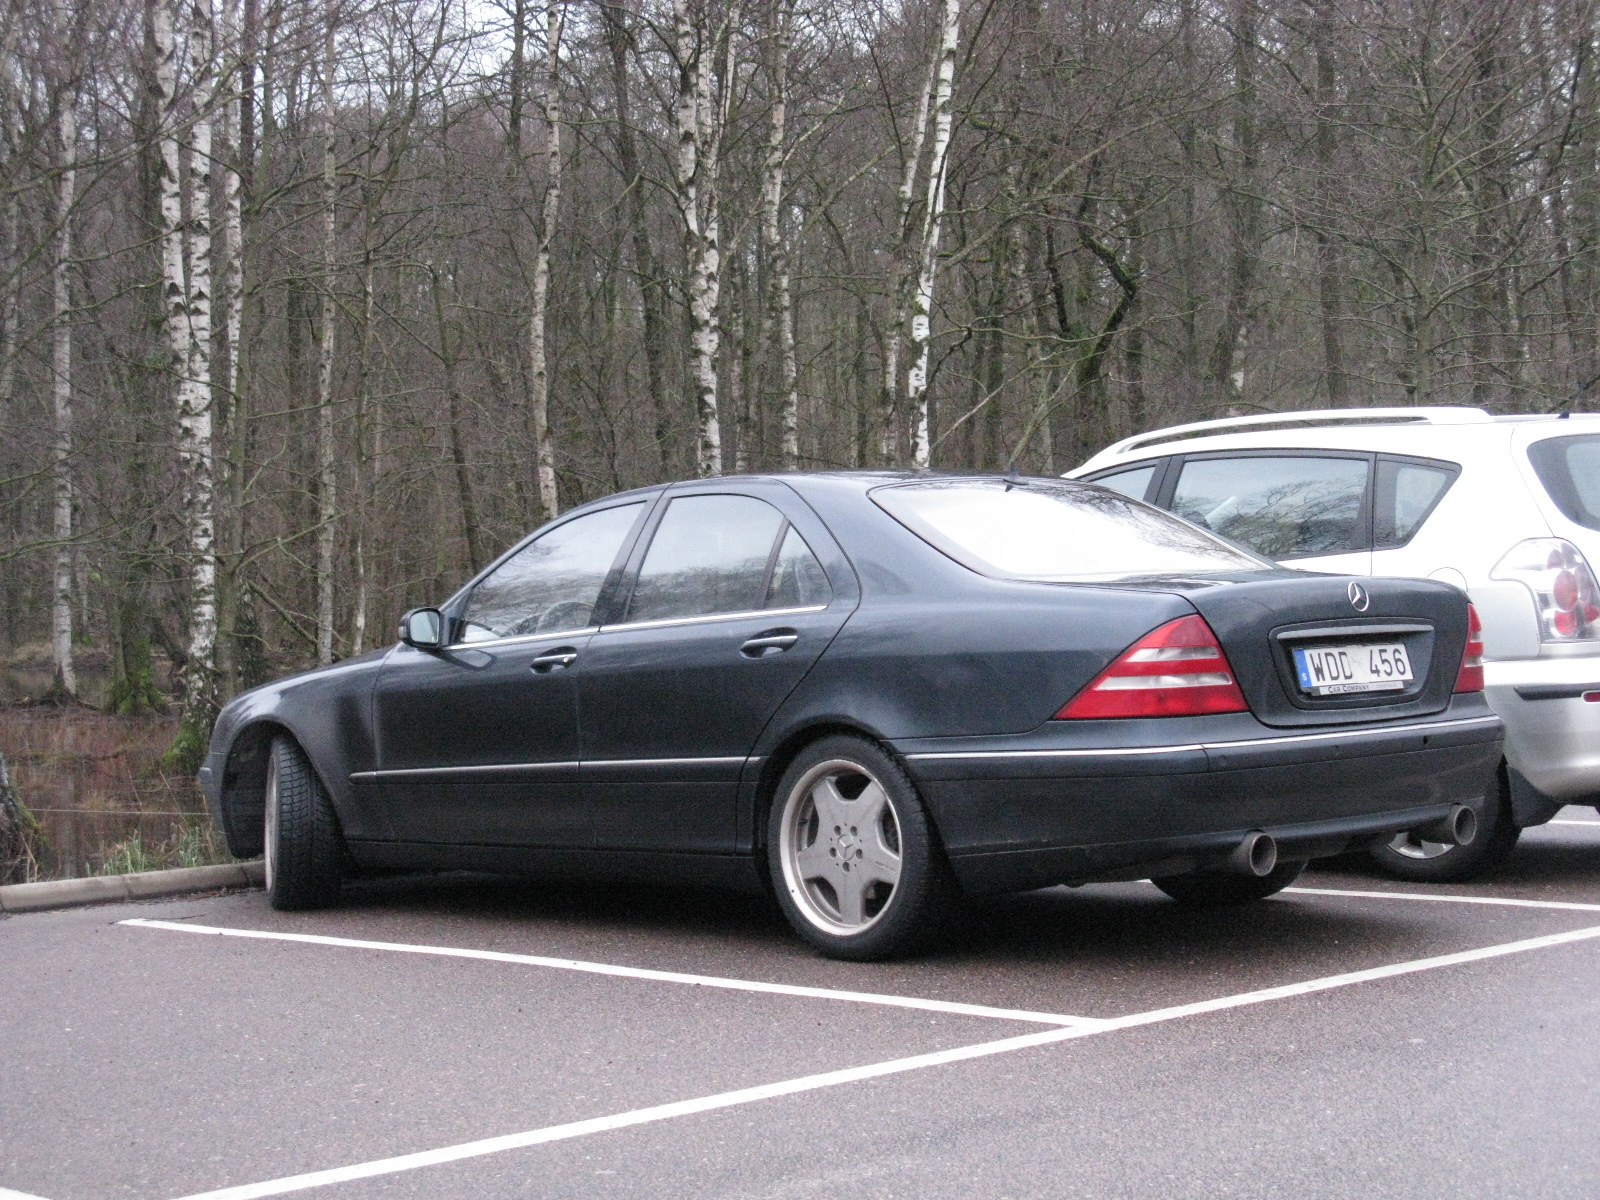 File:Mercedes-Benz S430 W220 (6527145705) jpg - Wikimedia